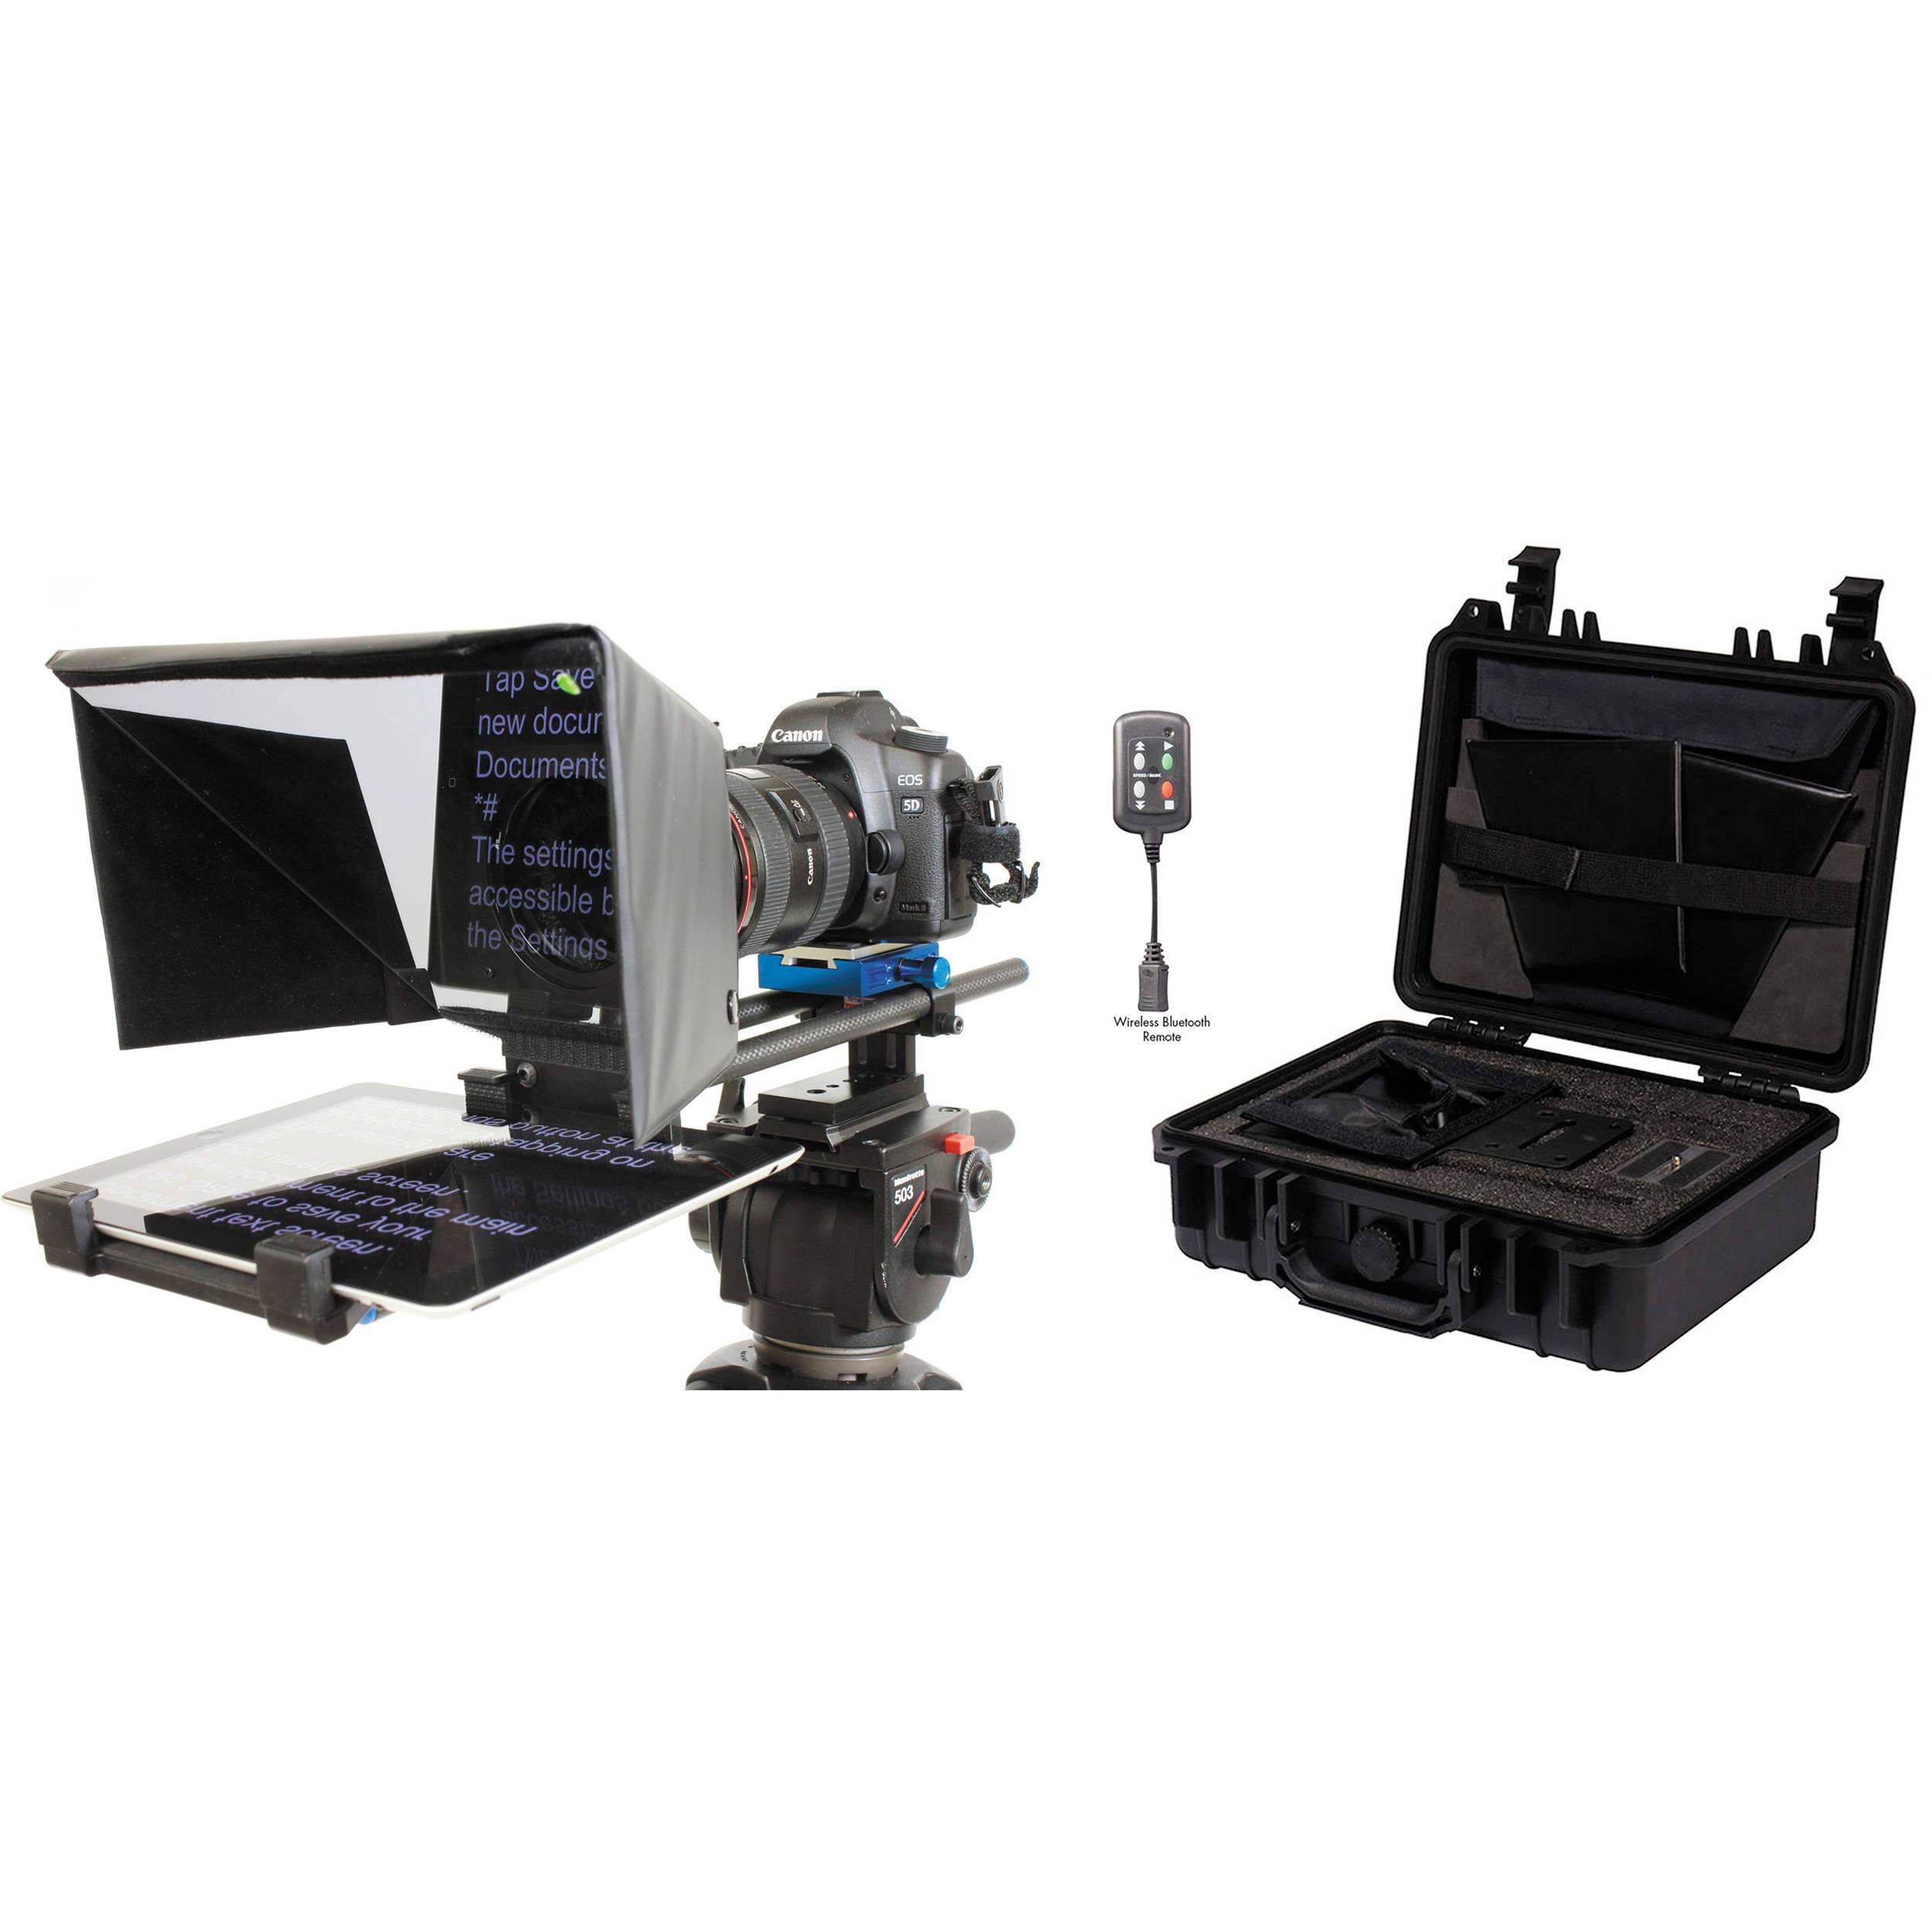 Datavideo TP500 PK Teleprompter Kit with Hard Case